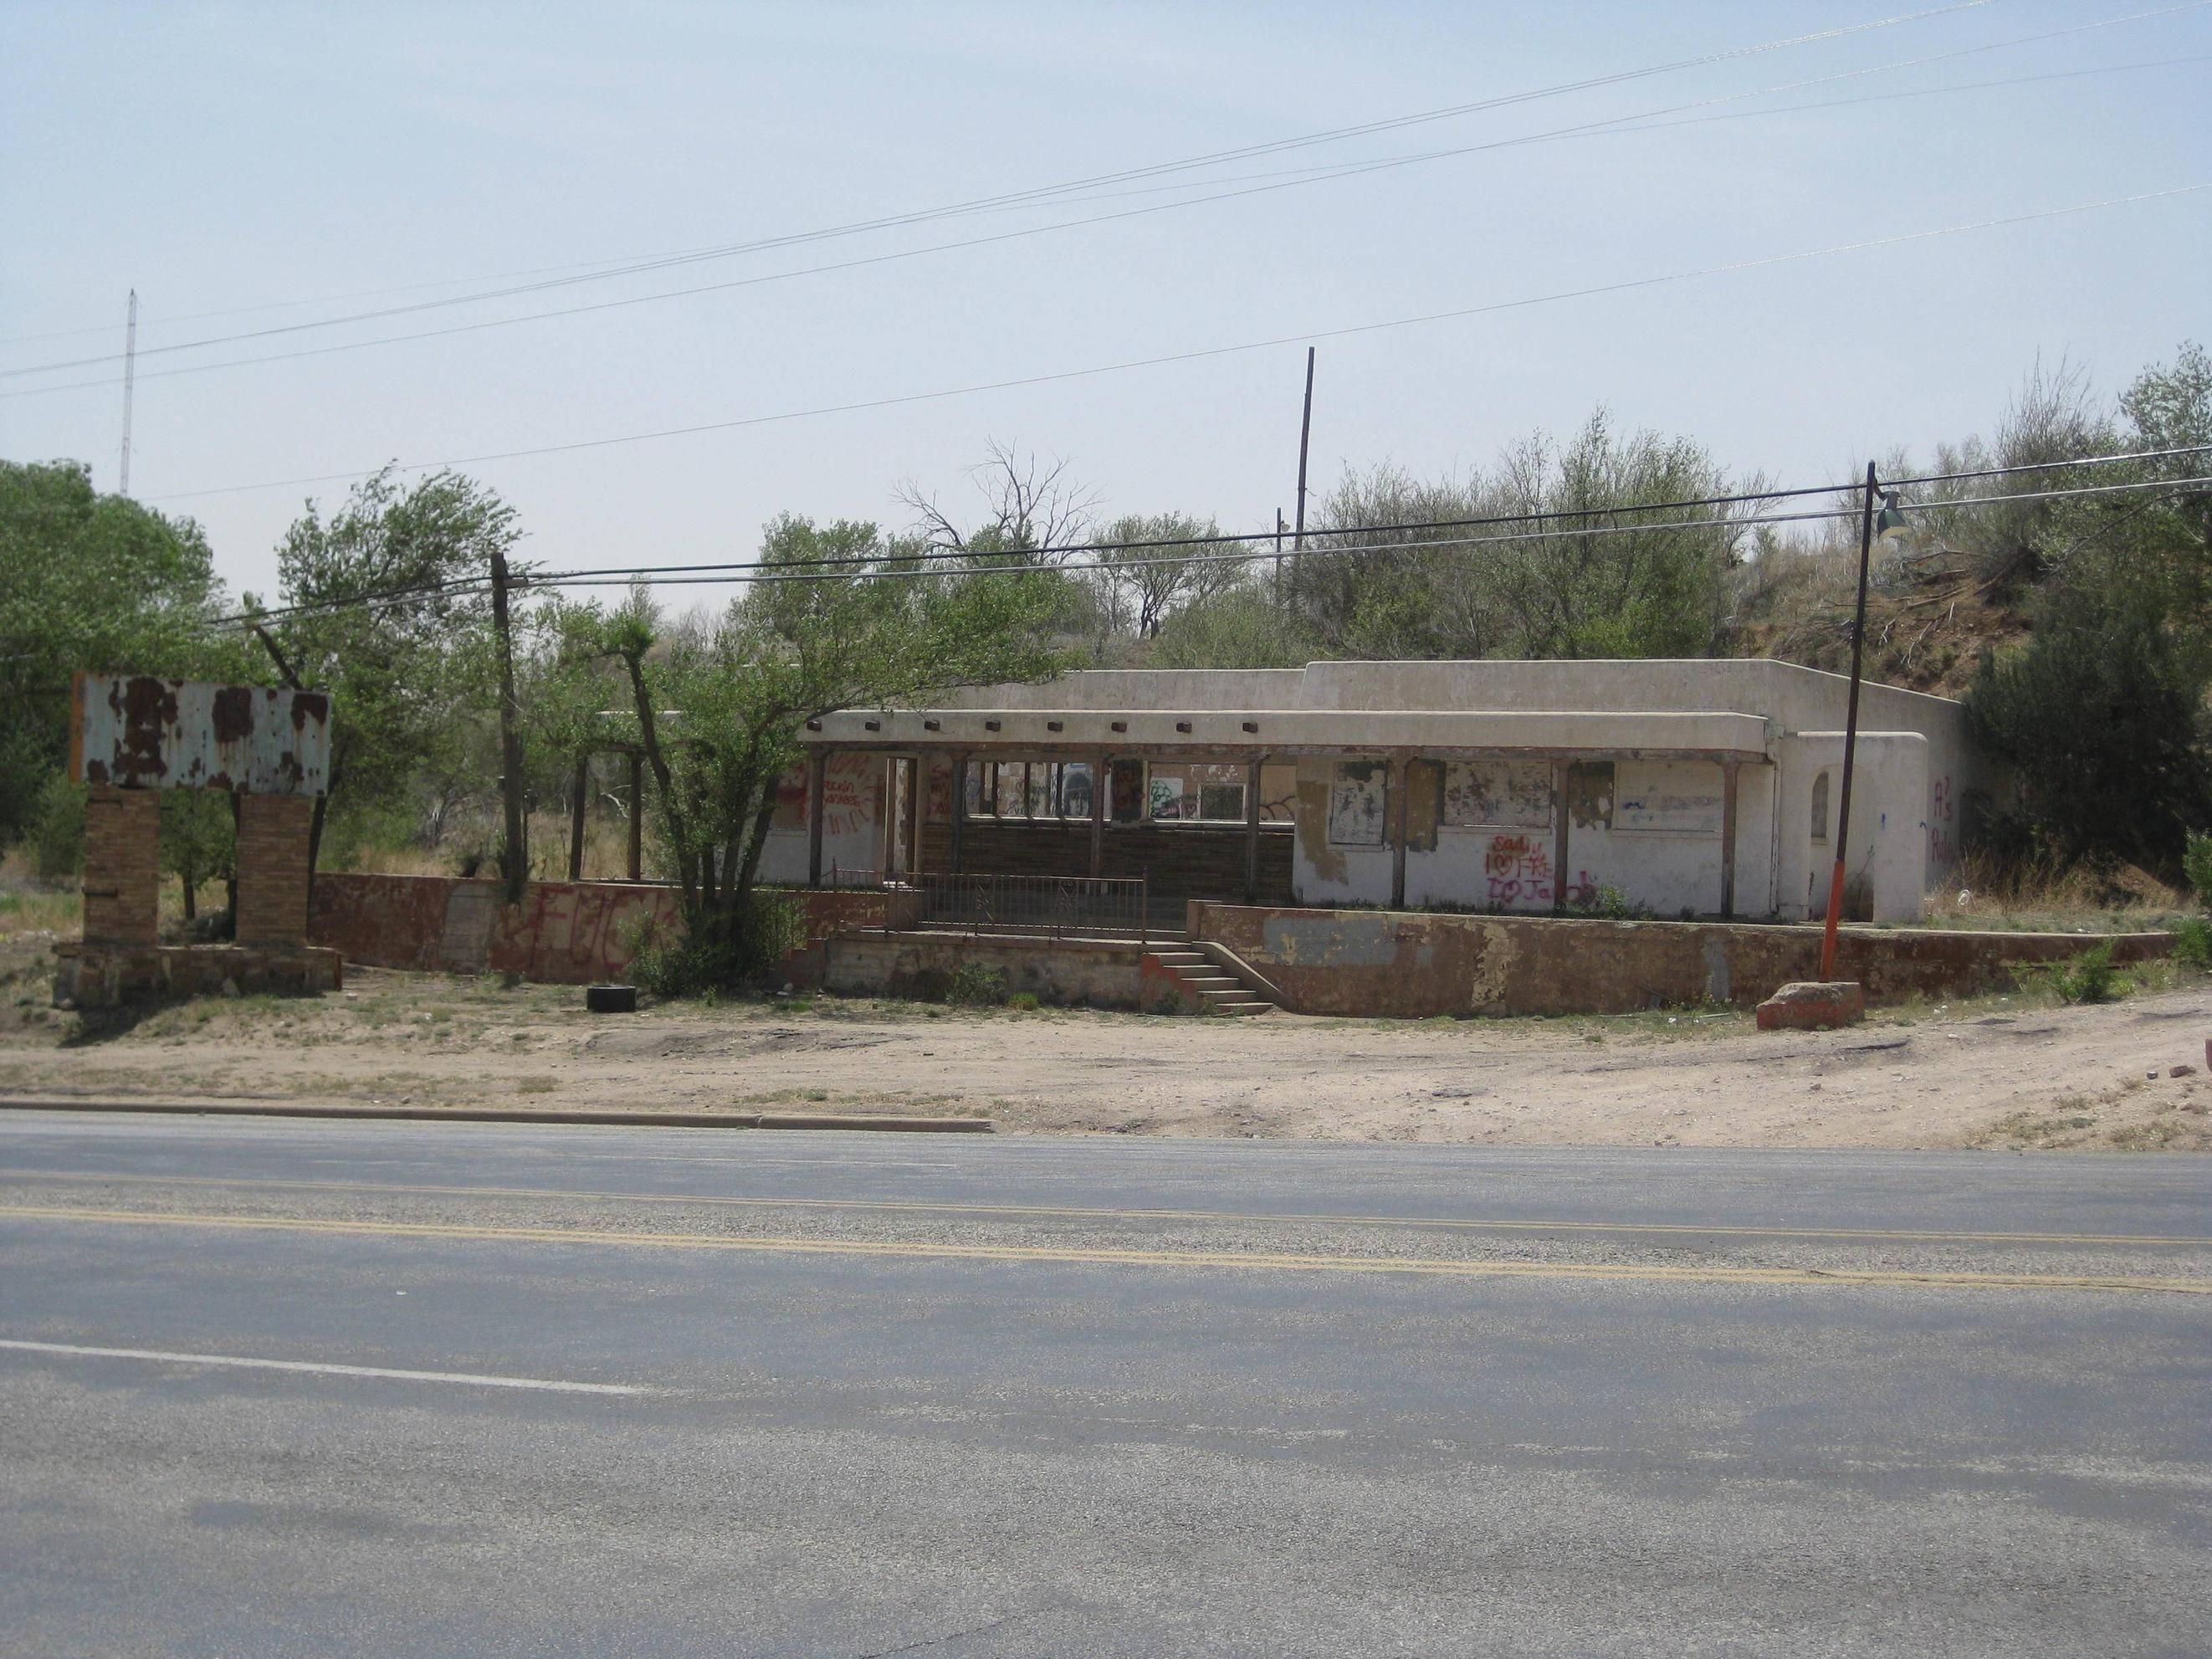 Abandoned Cliffhouse Restaurant Lubbock Tx 3264x2448